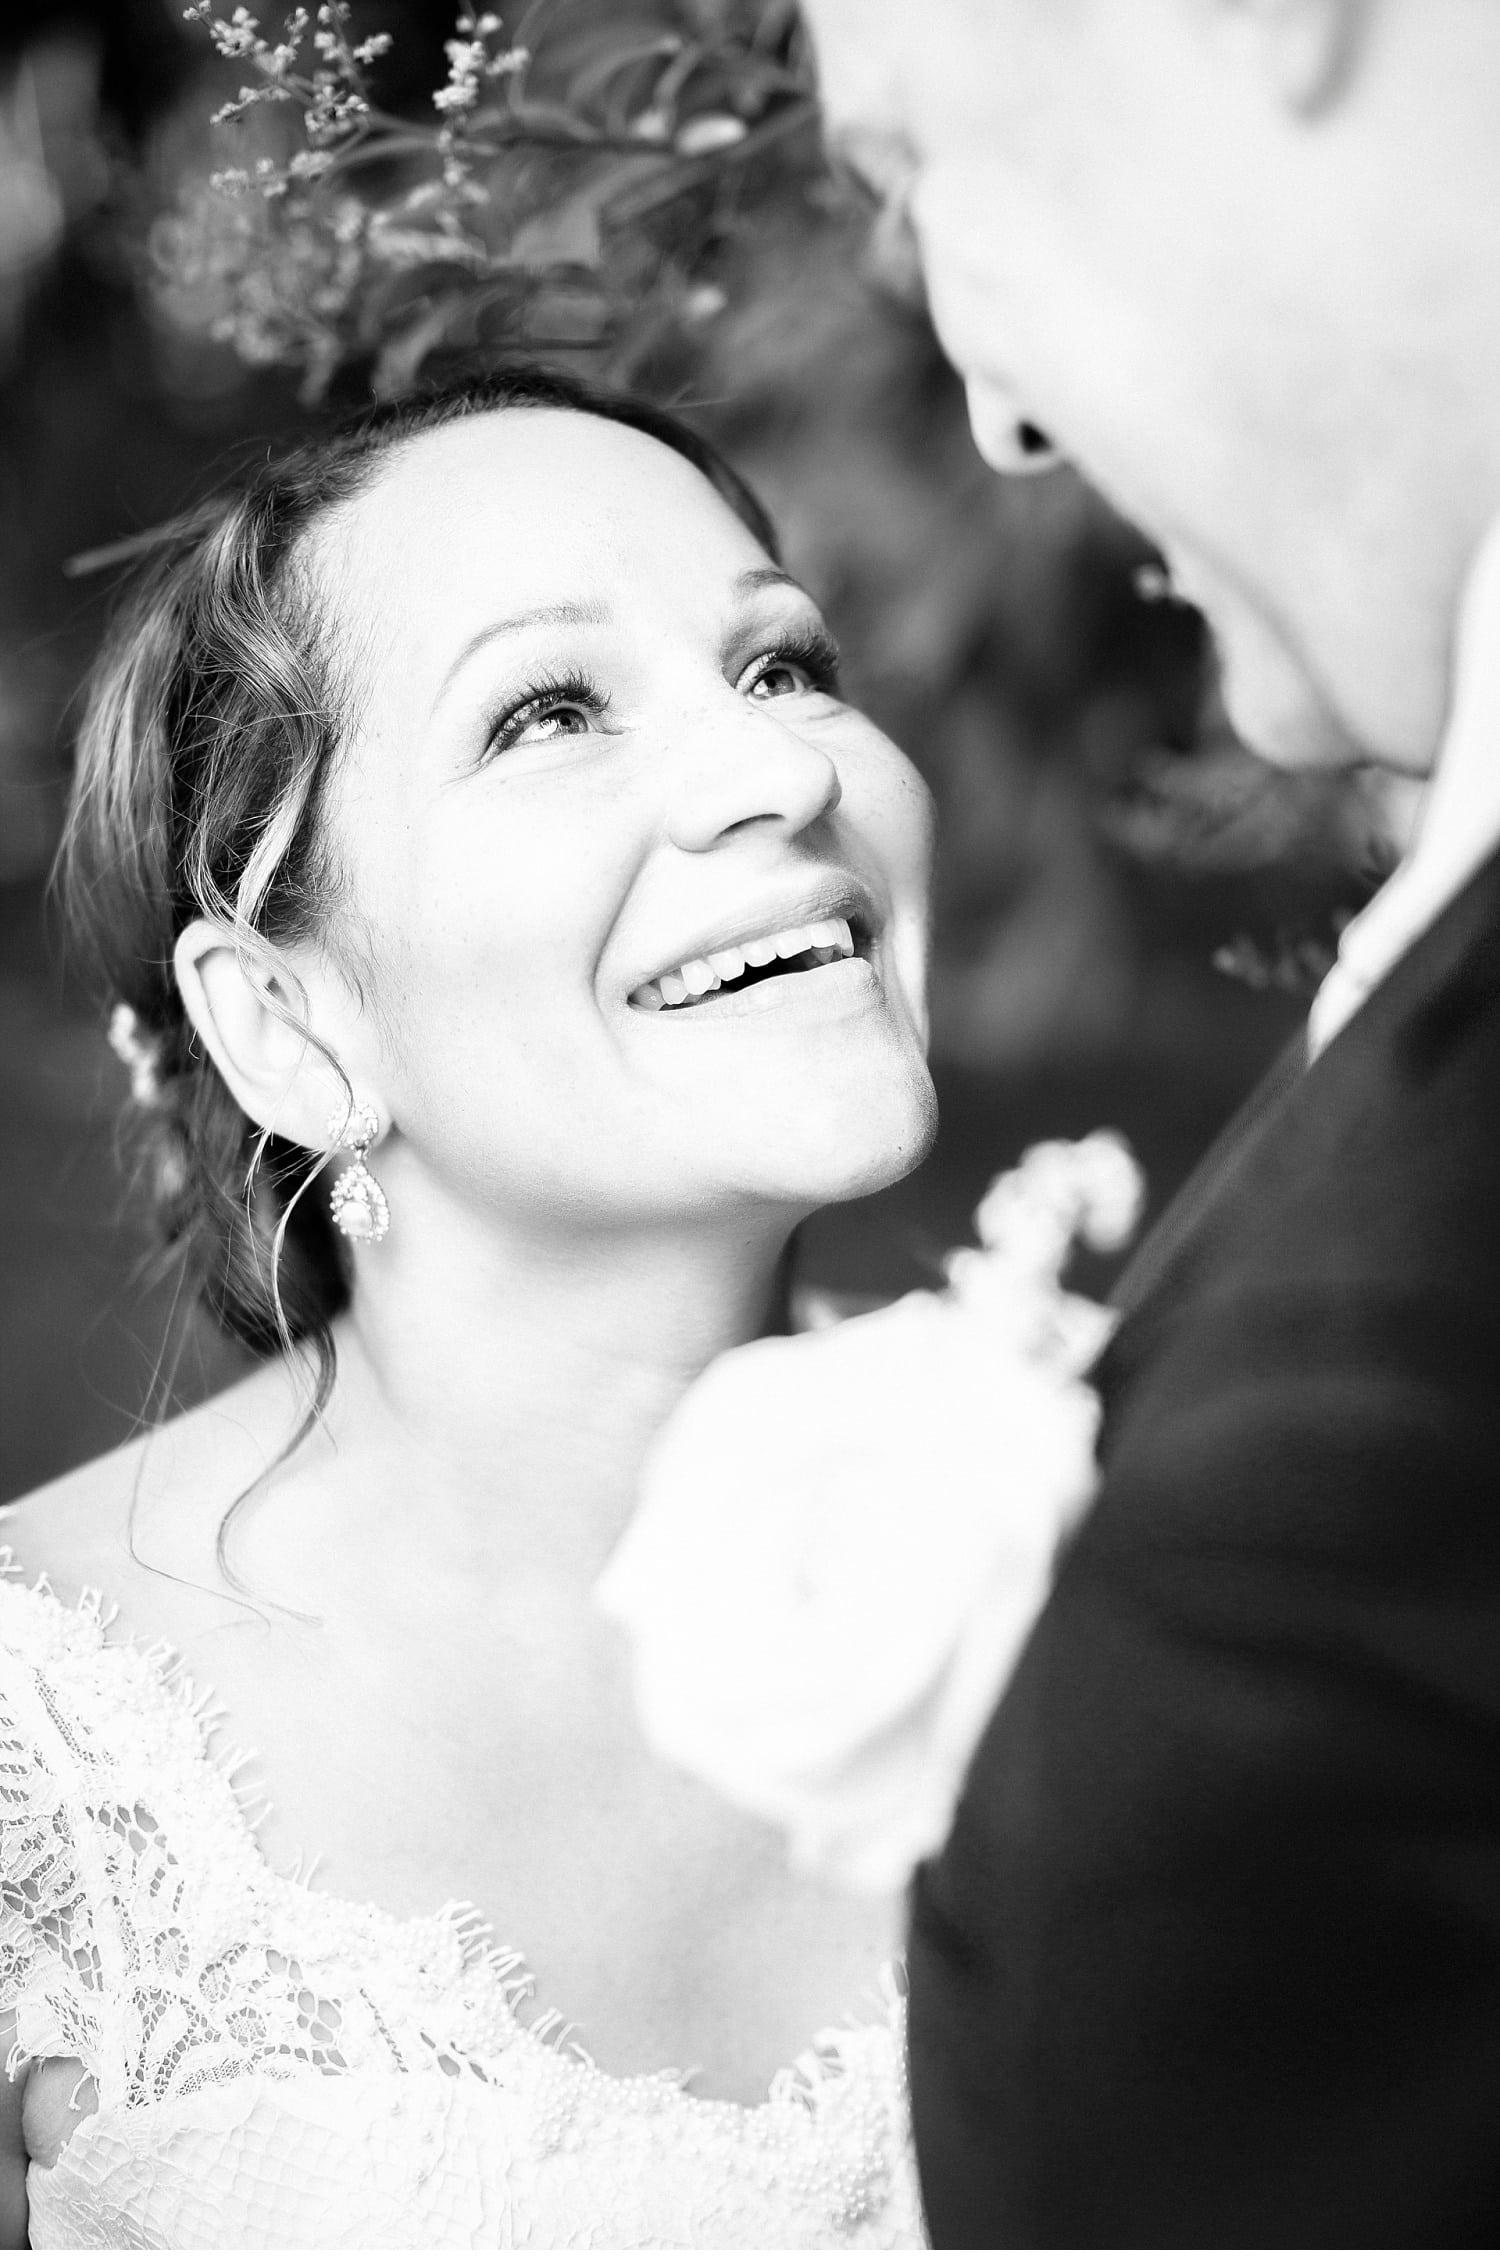 linnea johan 731 - Linnea & Johan Hedberg's Wedding wedding